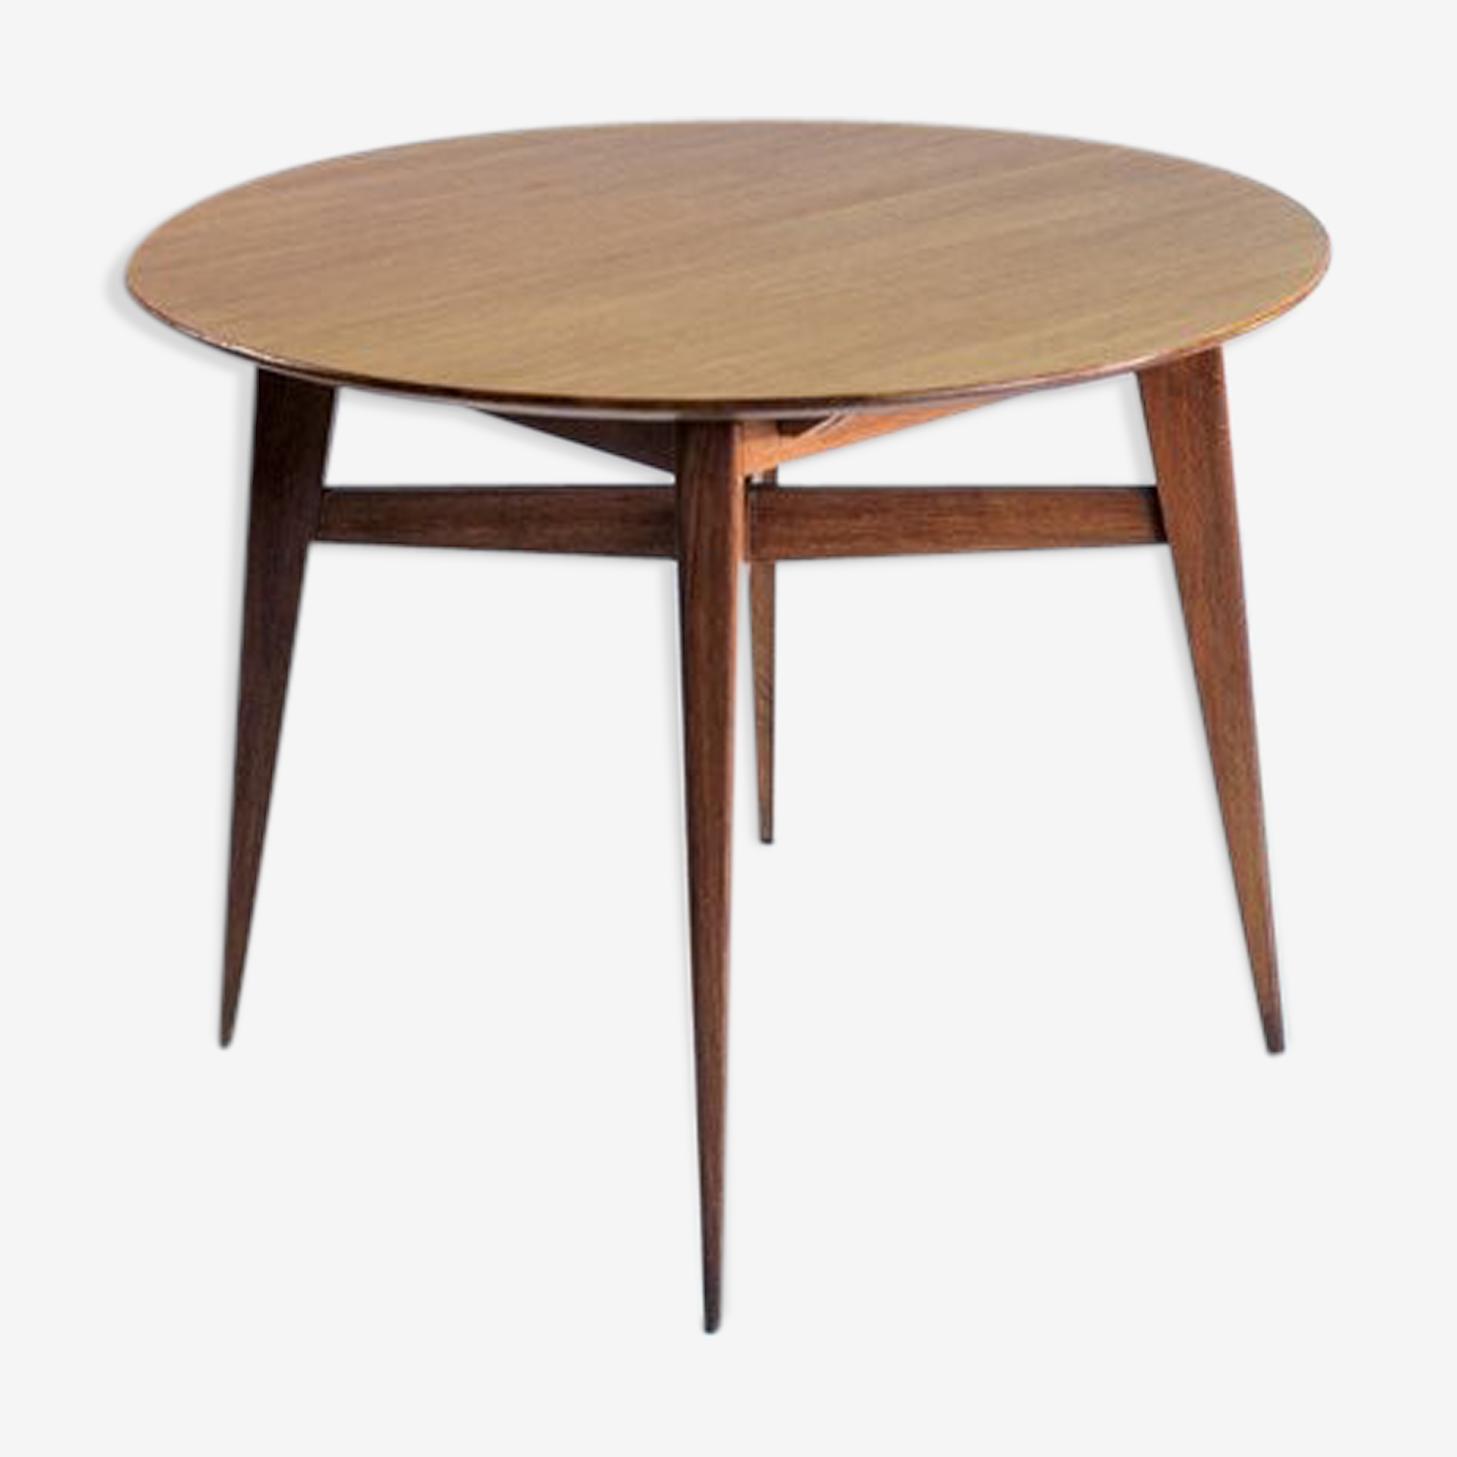 Table oak Roger Landault 1950